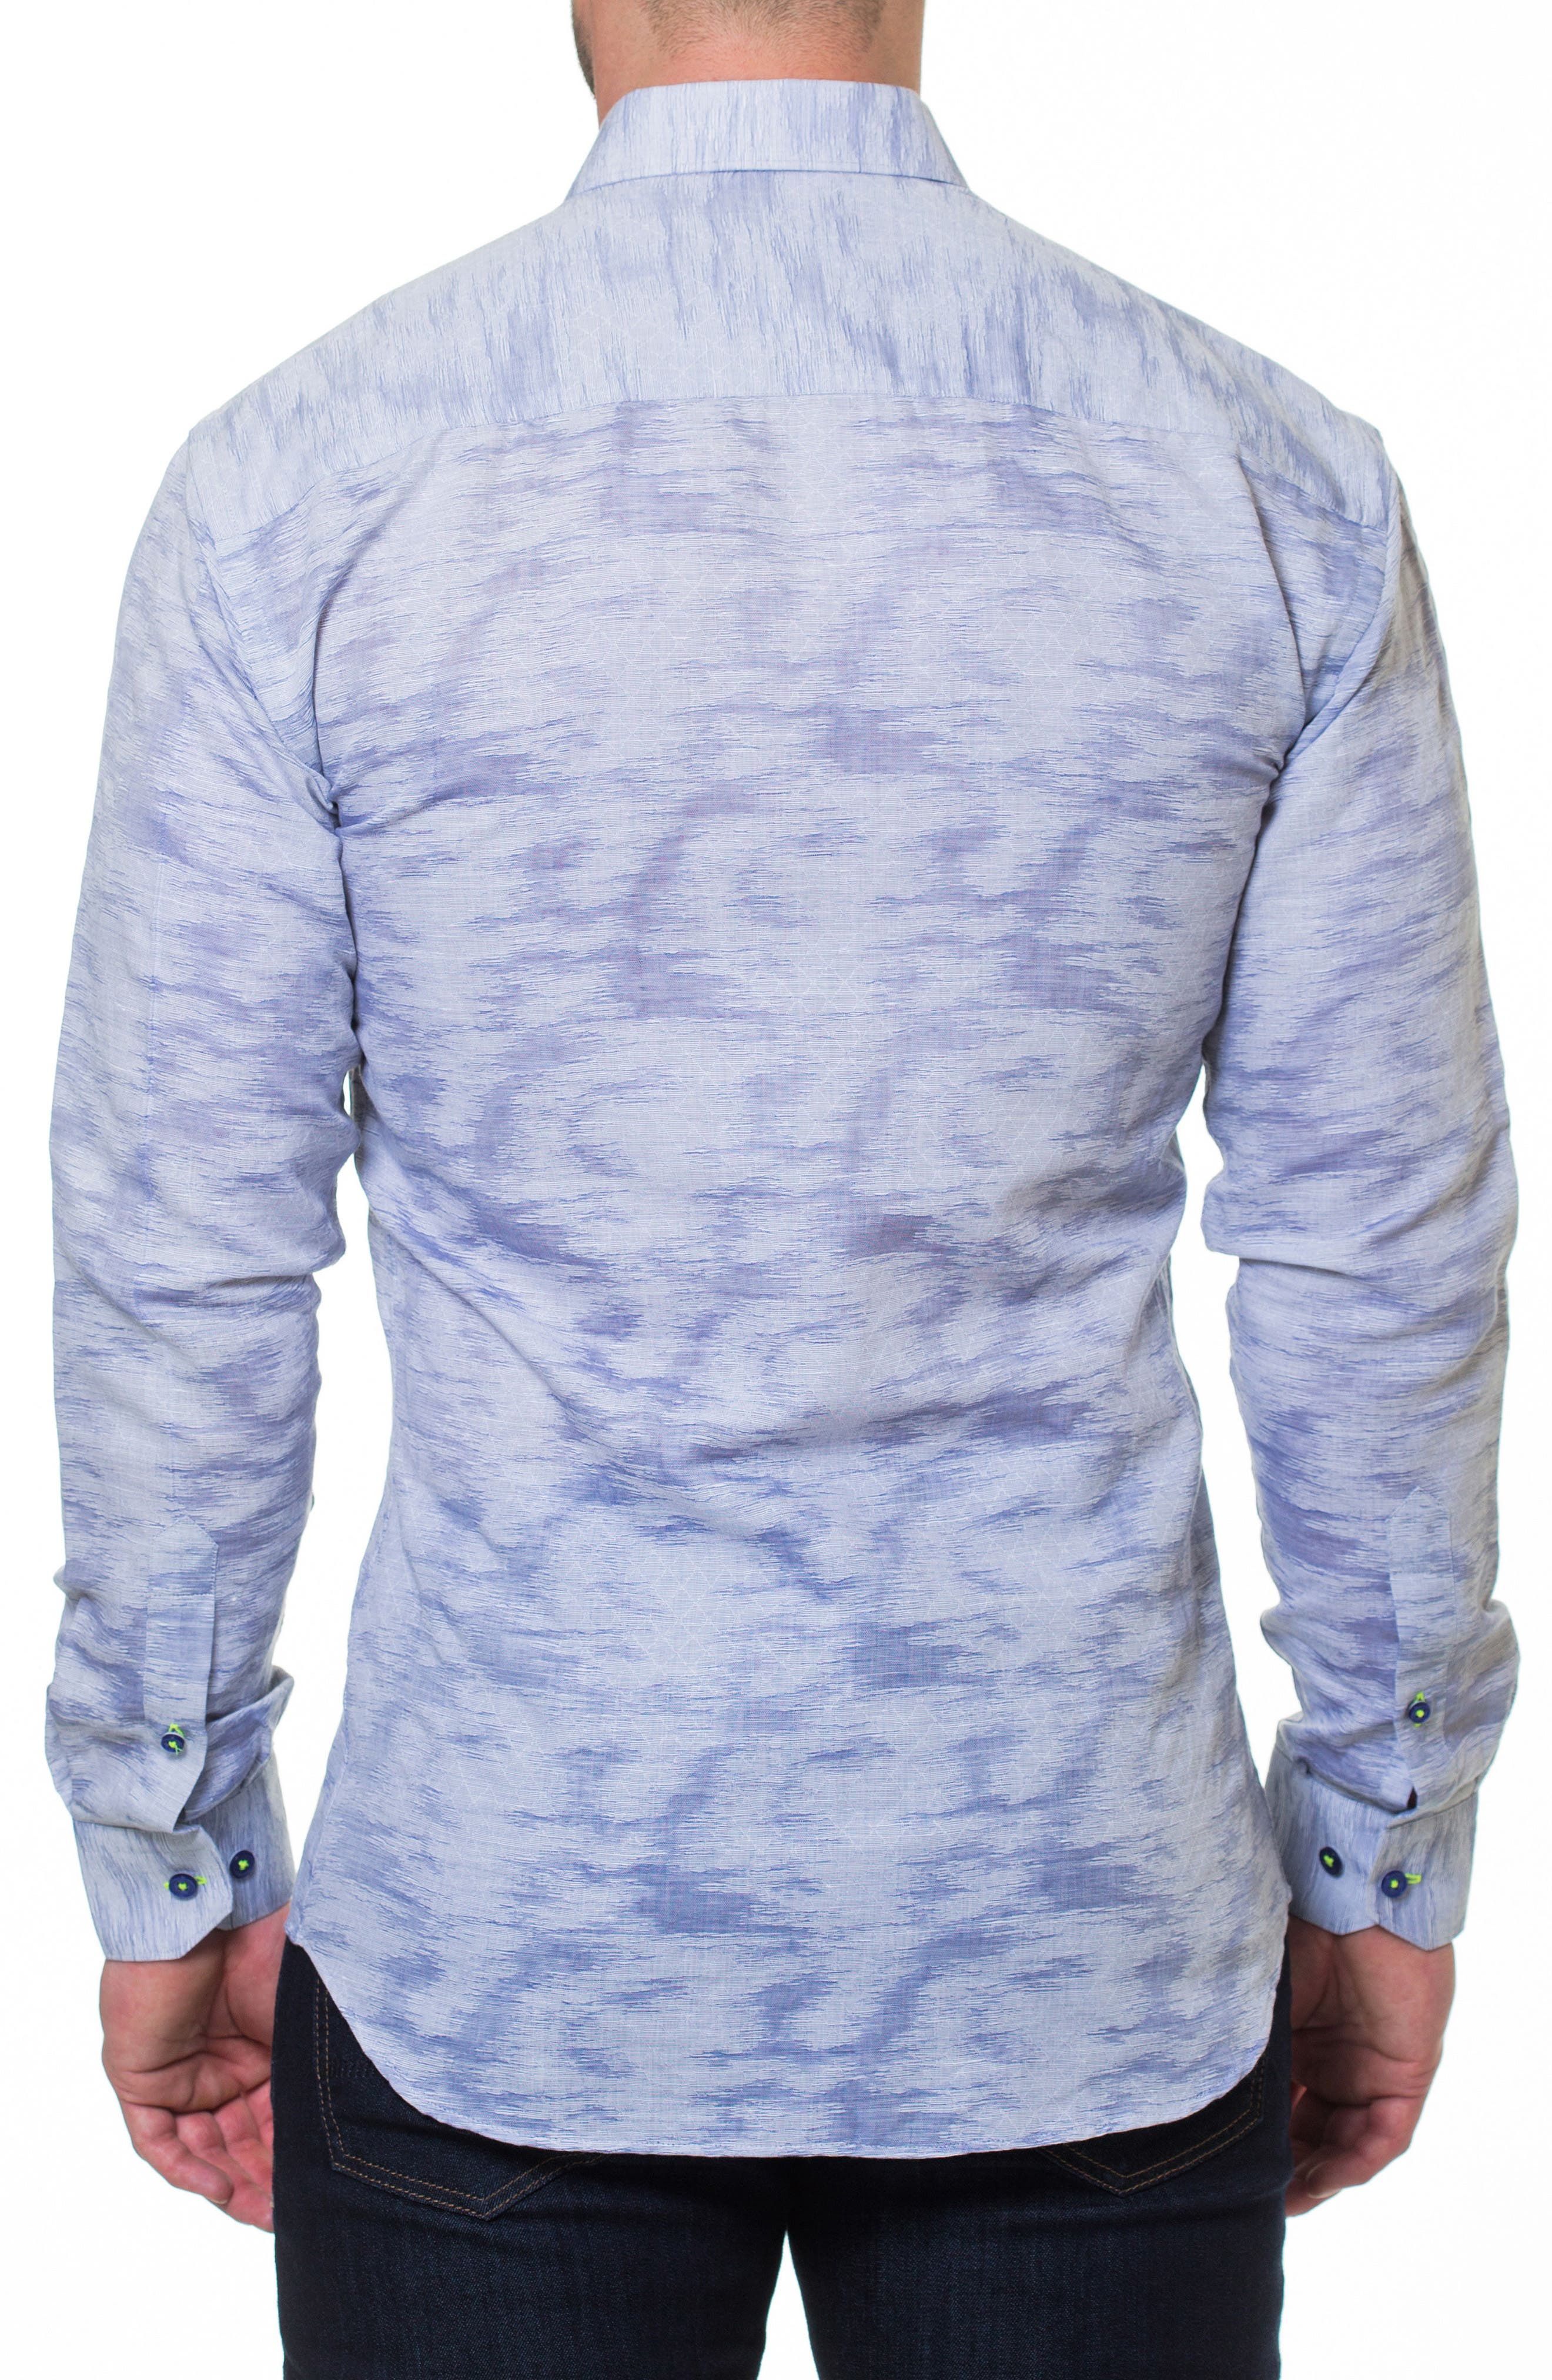 Luxor Richter Slim Fit Sport Shirt,                             Alternate thumbnail 2, color,                             030